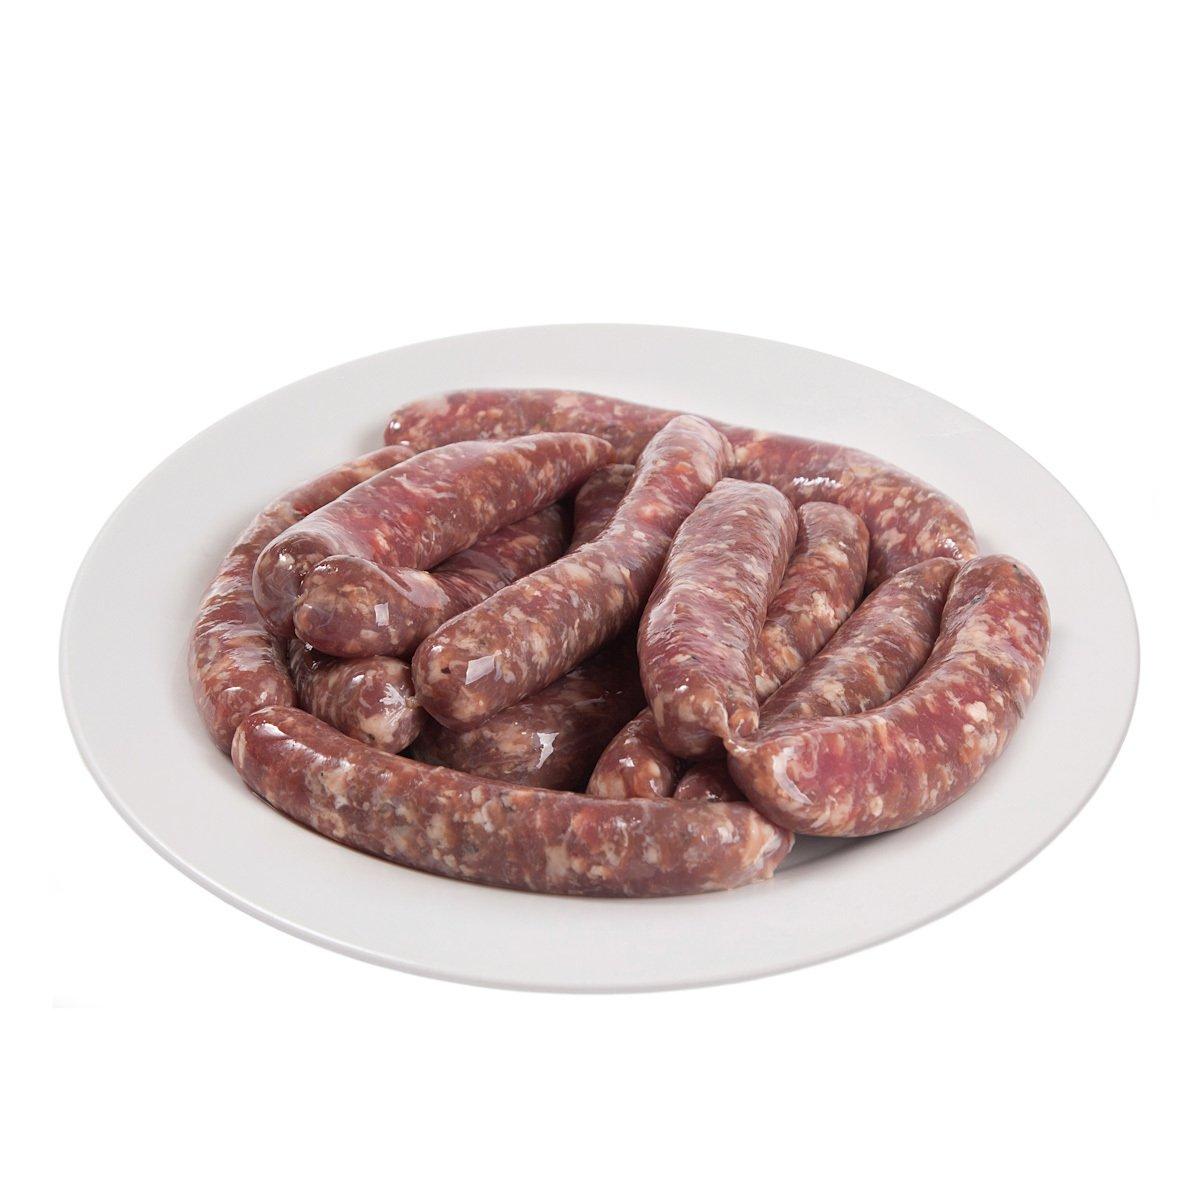 Колбаски для гриля говяжьи